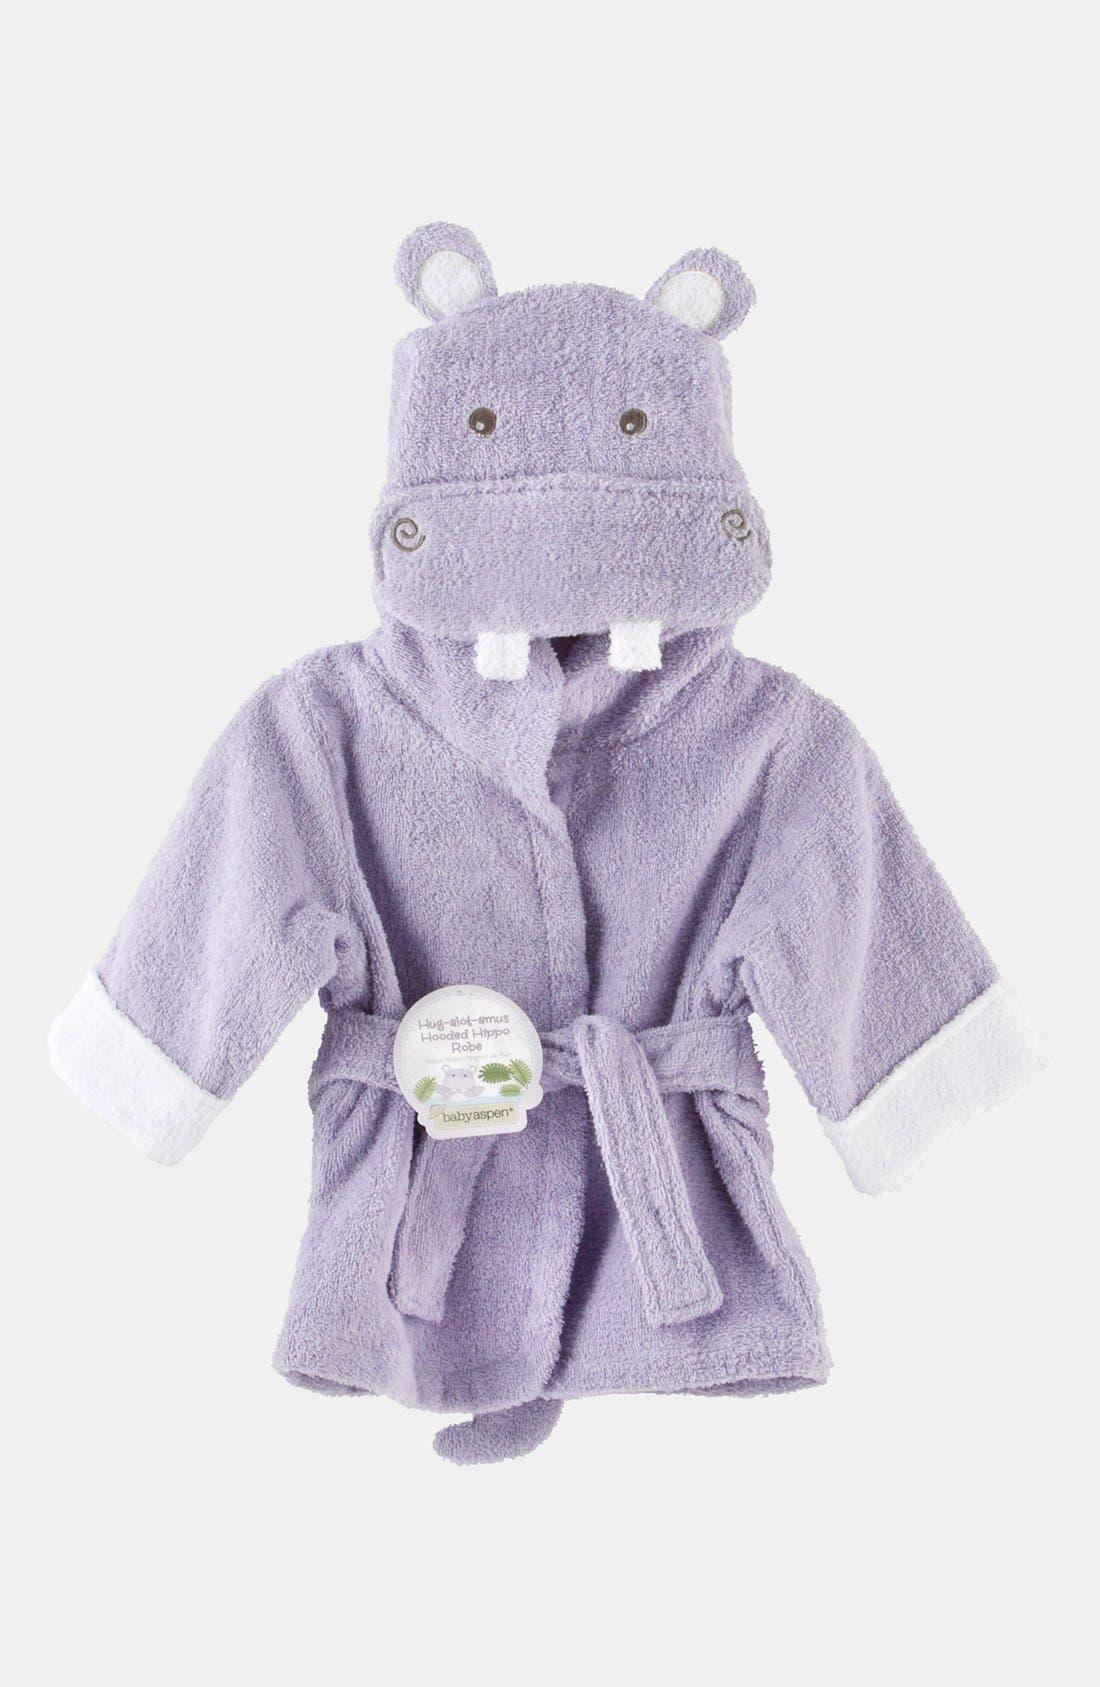 Alternate Image 1 Selected - Baby Aspen 'Hug a Lot Amus' Hooded Robe (Baby)